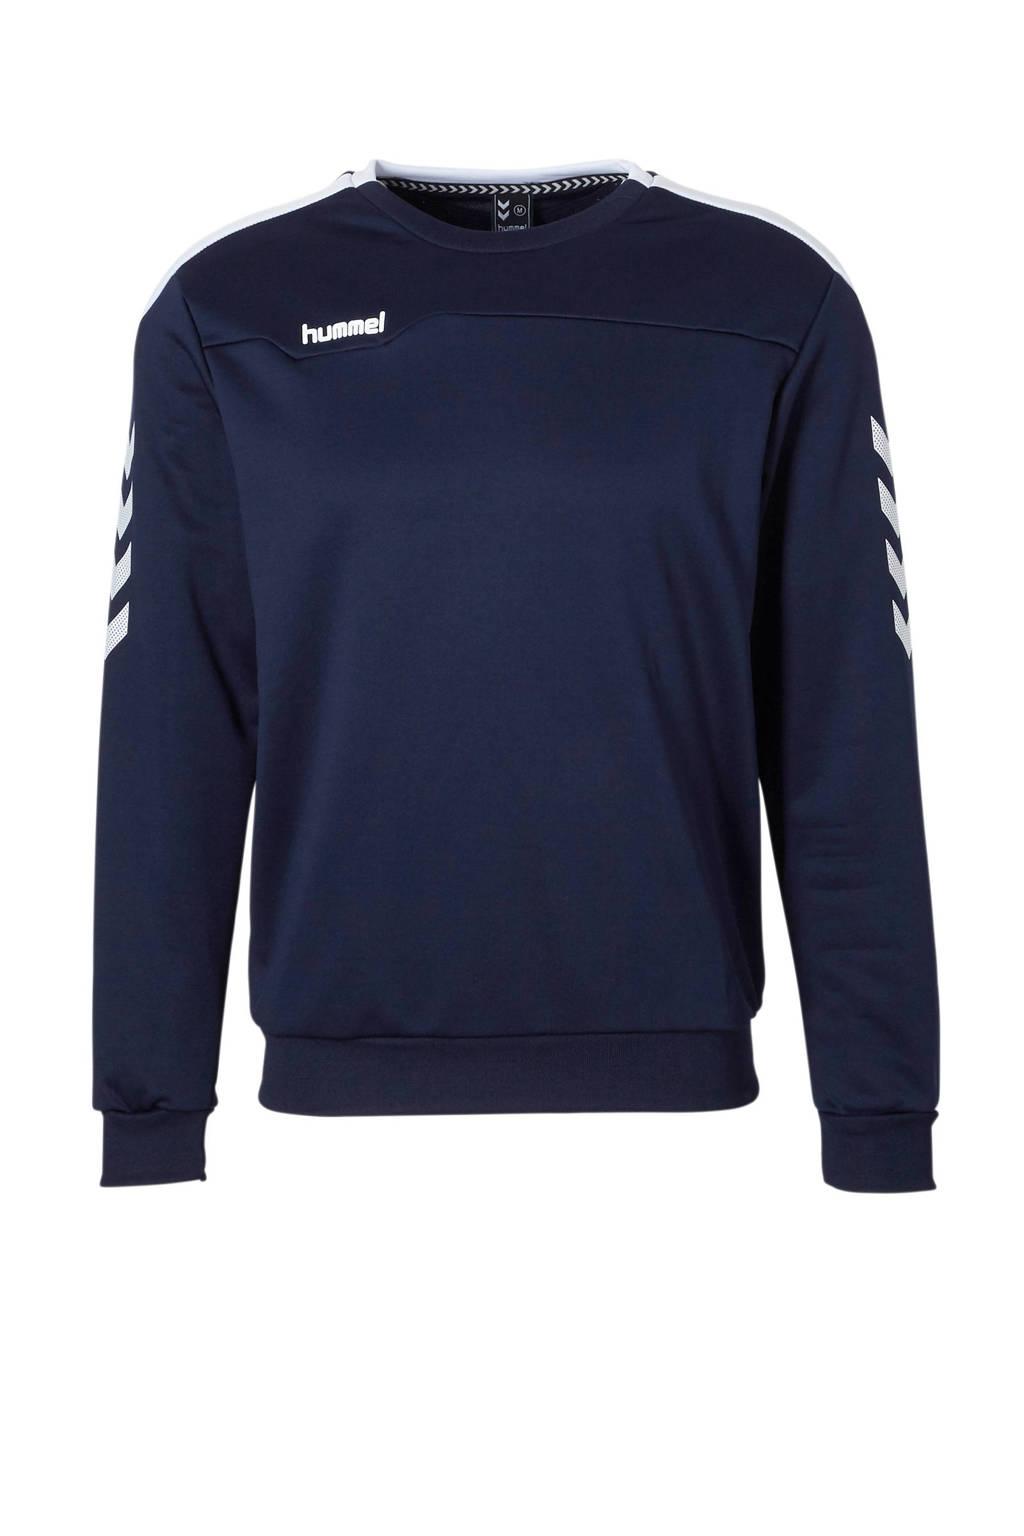 hummel   sportsweater donkerblauw, Donkerblauw/wit, Heren